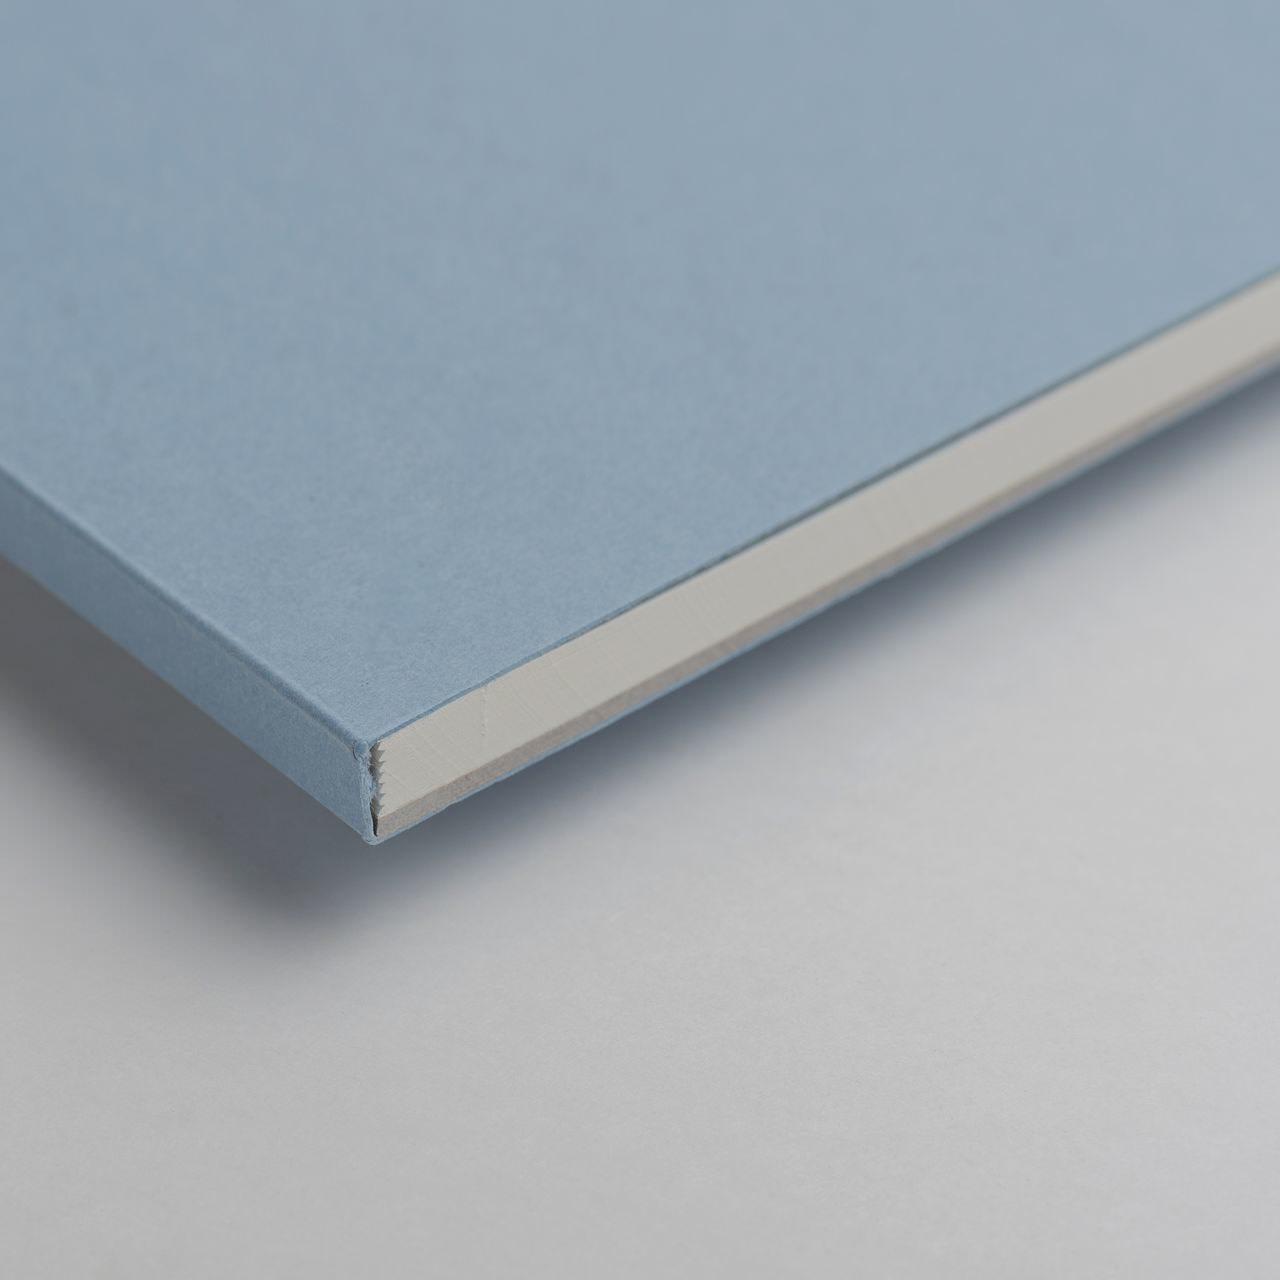 A5 Голубой скетчбук с перфорацией Falafel books Sketchbook Ash Blue